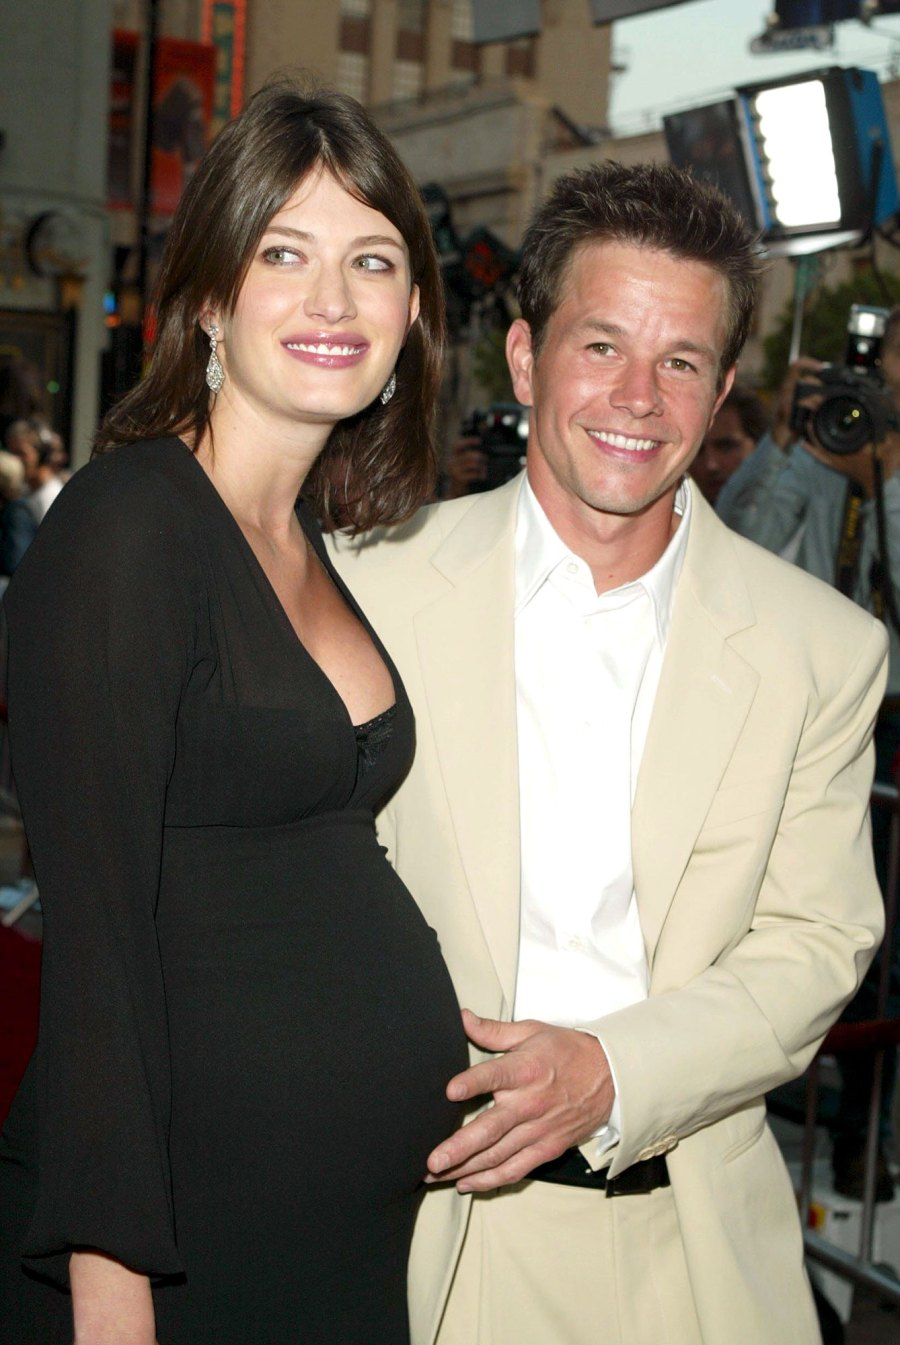 2003 Mark Wahlberg and Rhea Durham Relationship Timeline